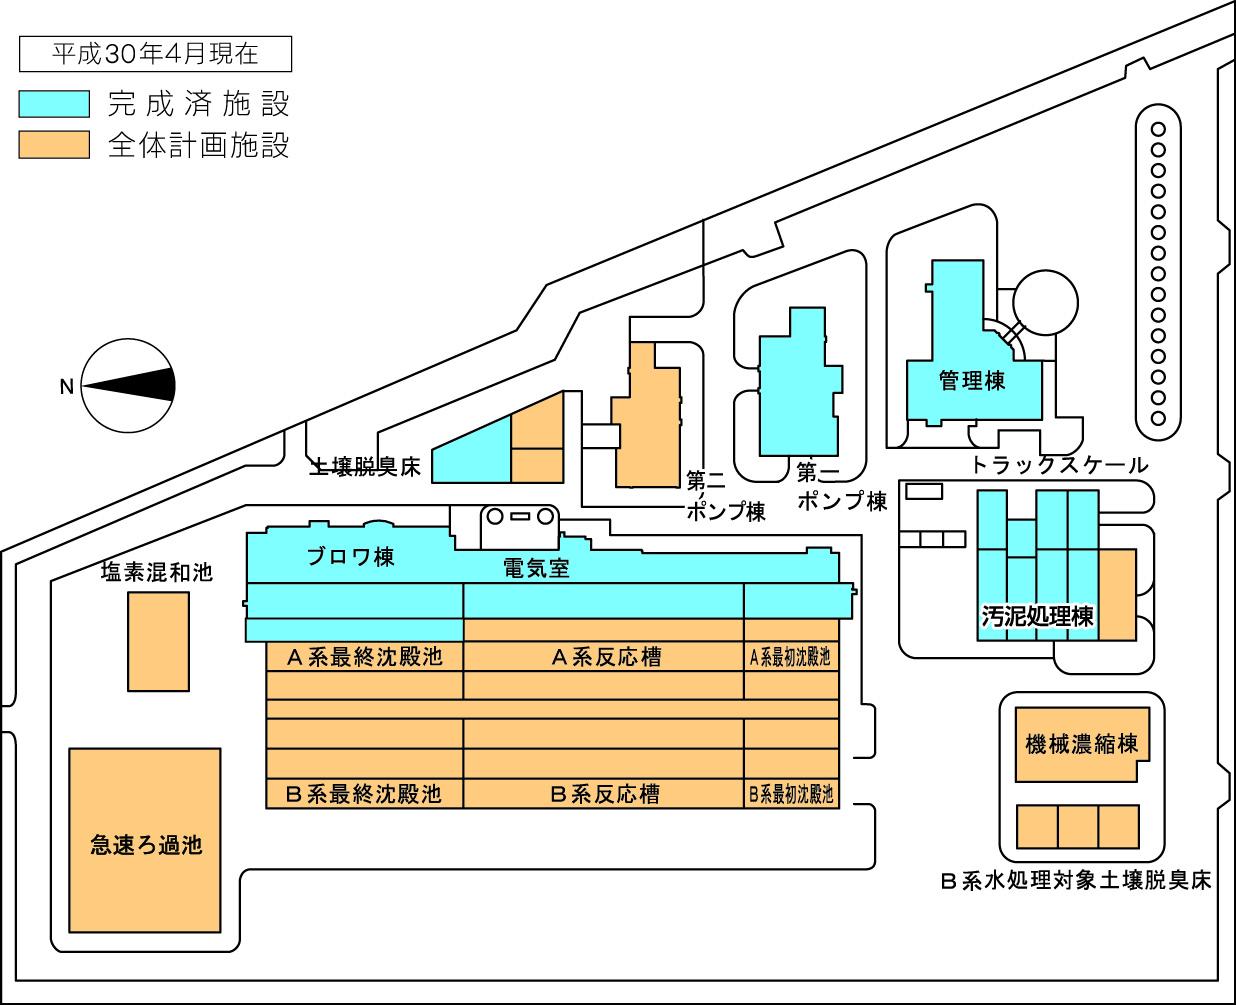 center-ongachuryu-haichi